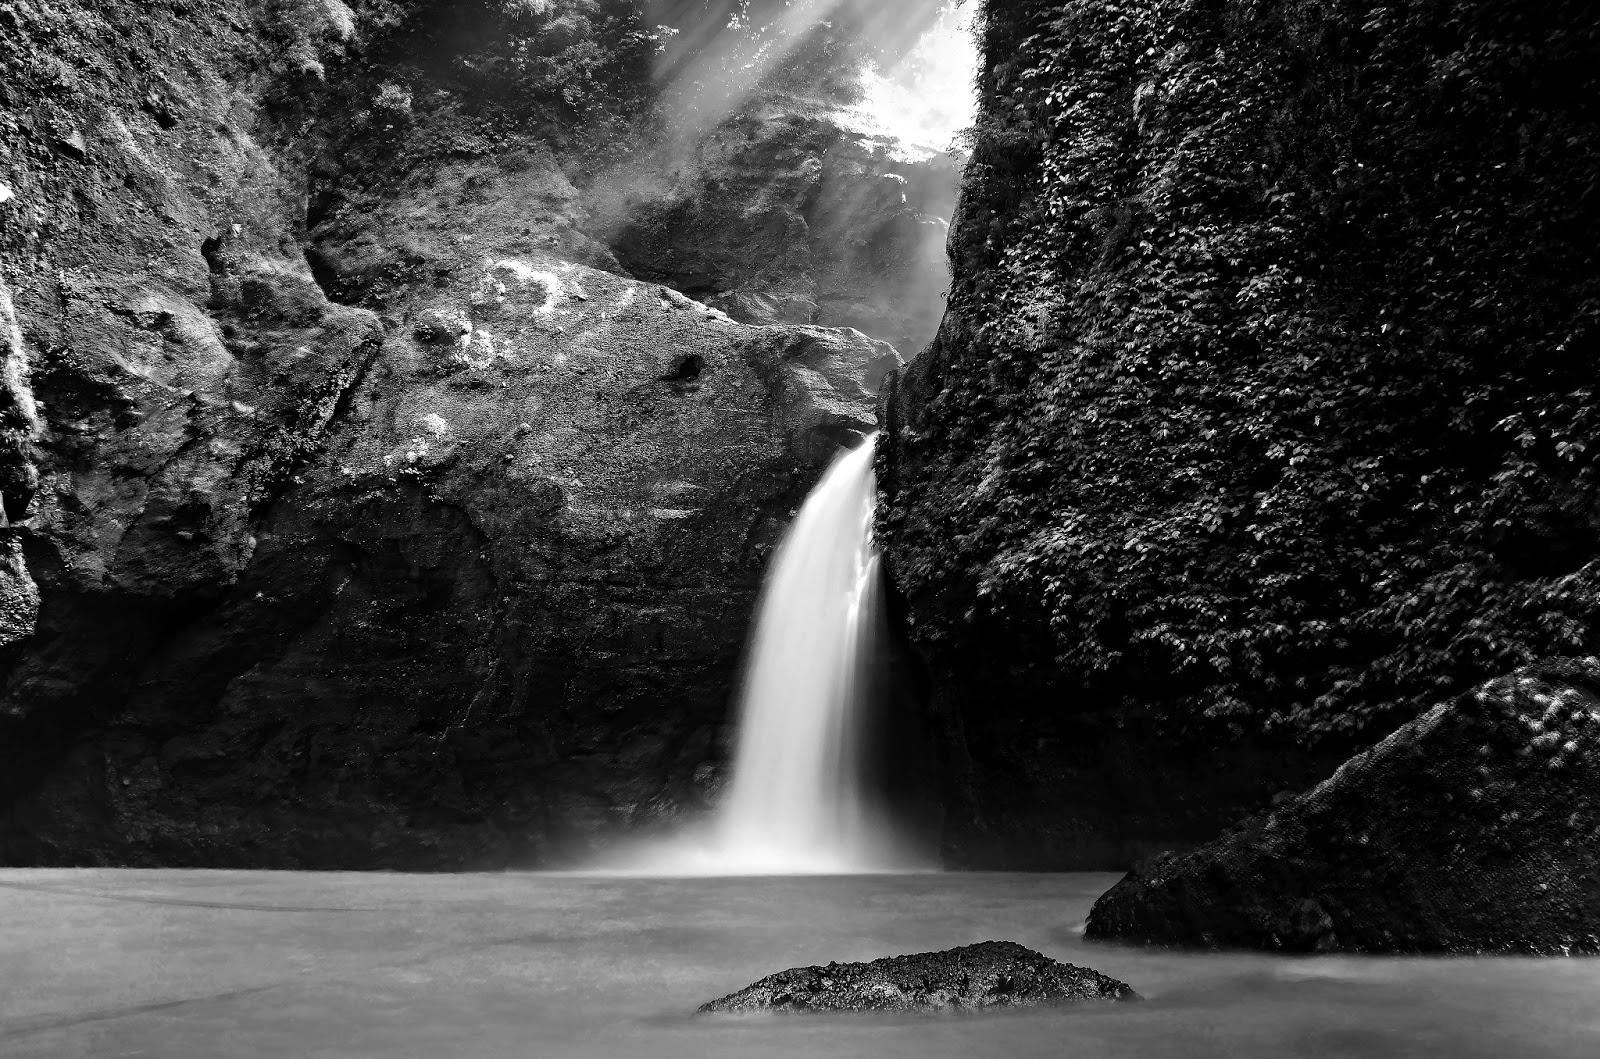 Travel, Adventures and Photography: Pagsanjan Falls Magdapio Falls.